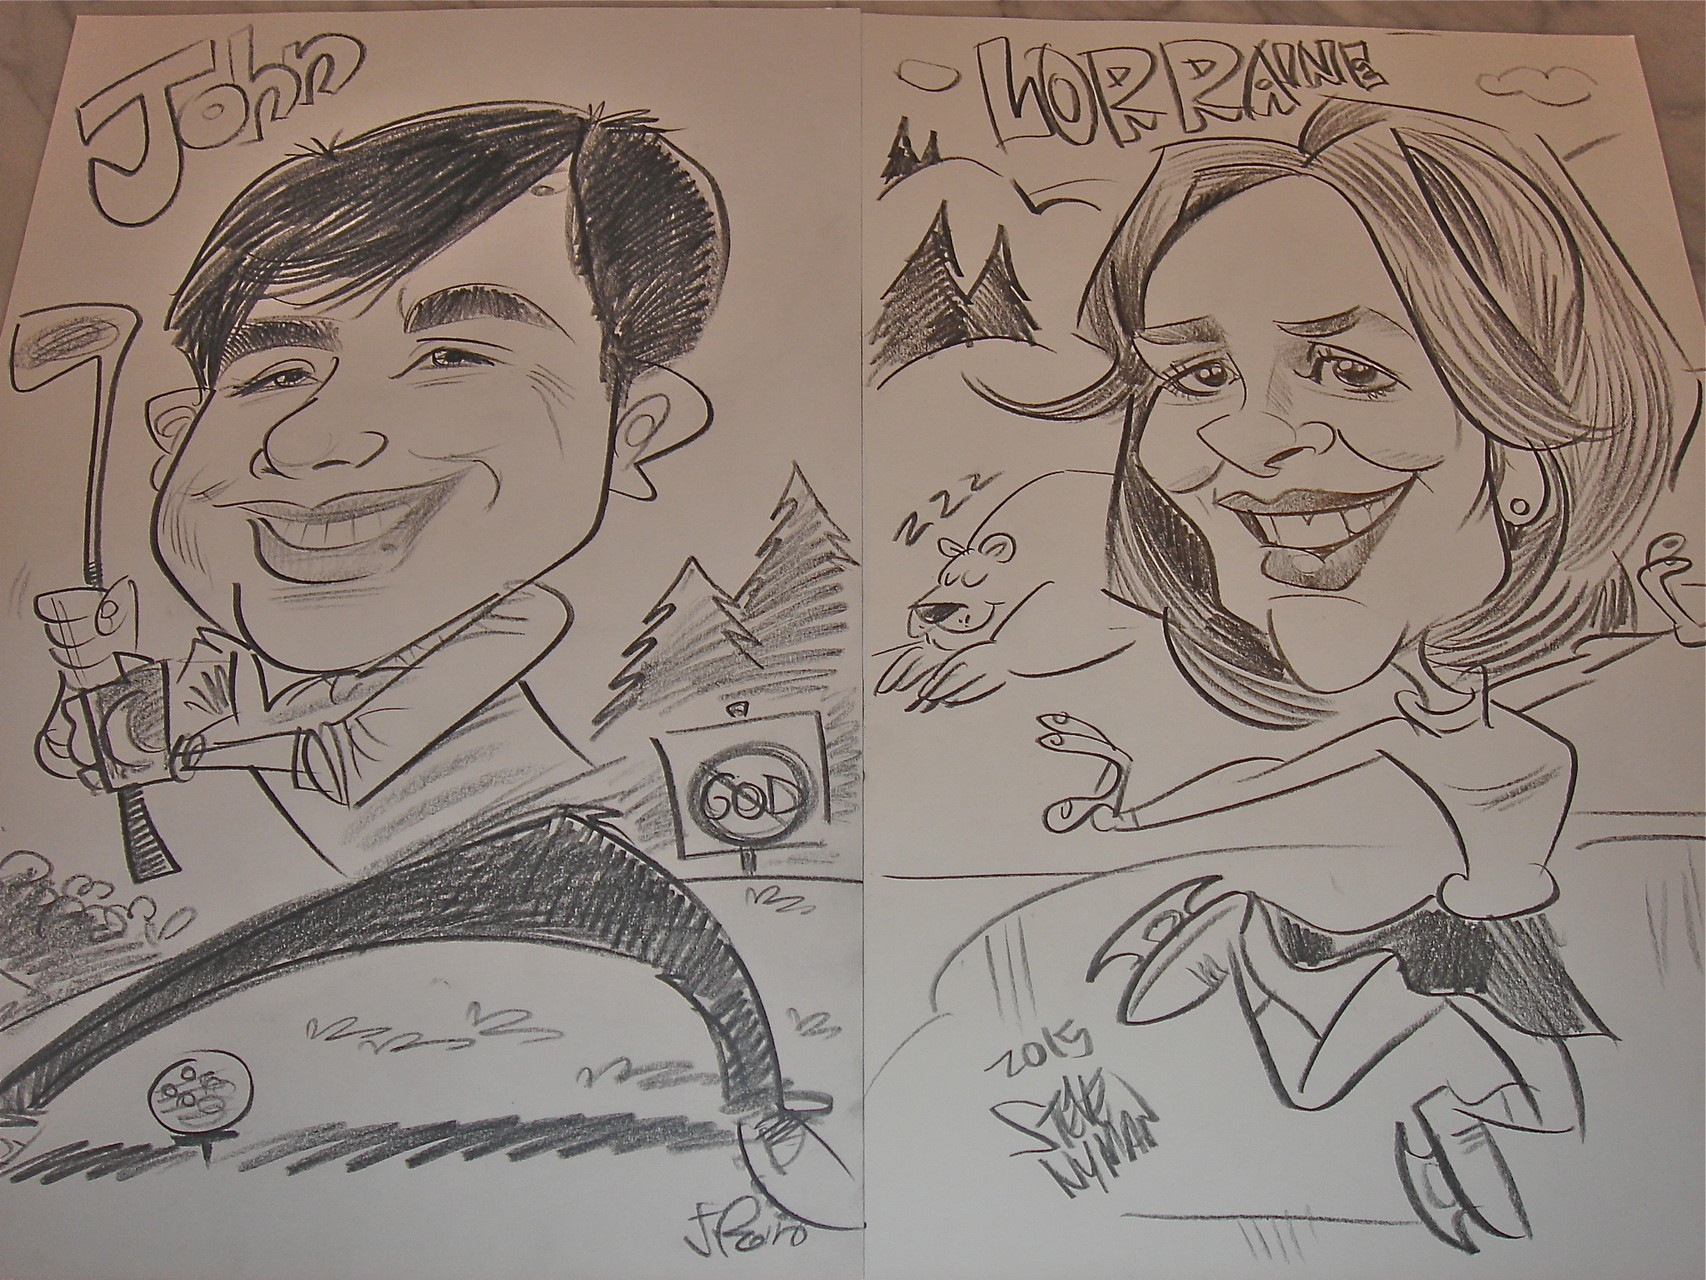 John & Lorraine's charicatures